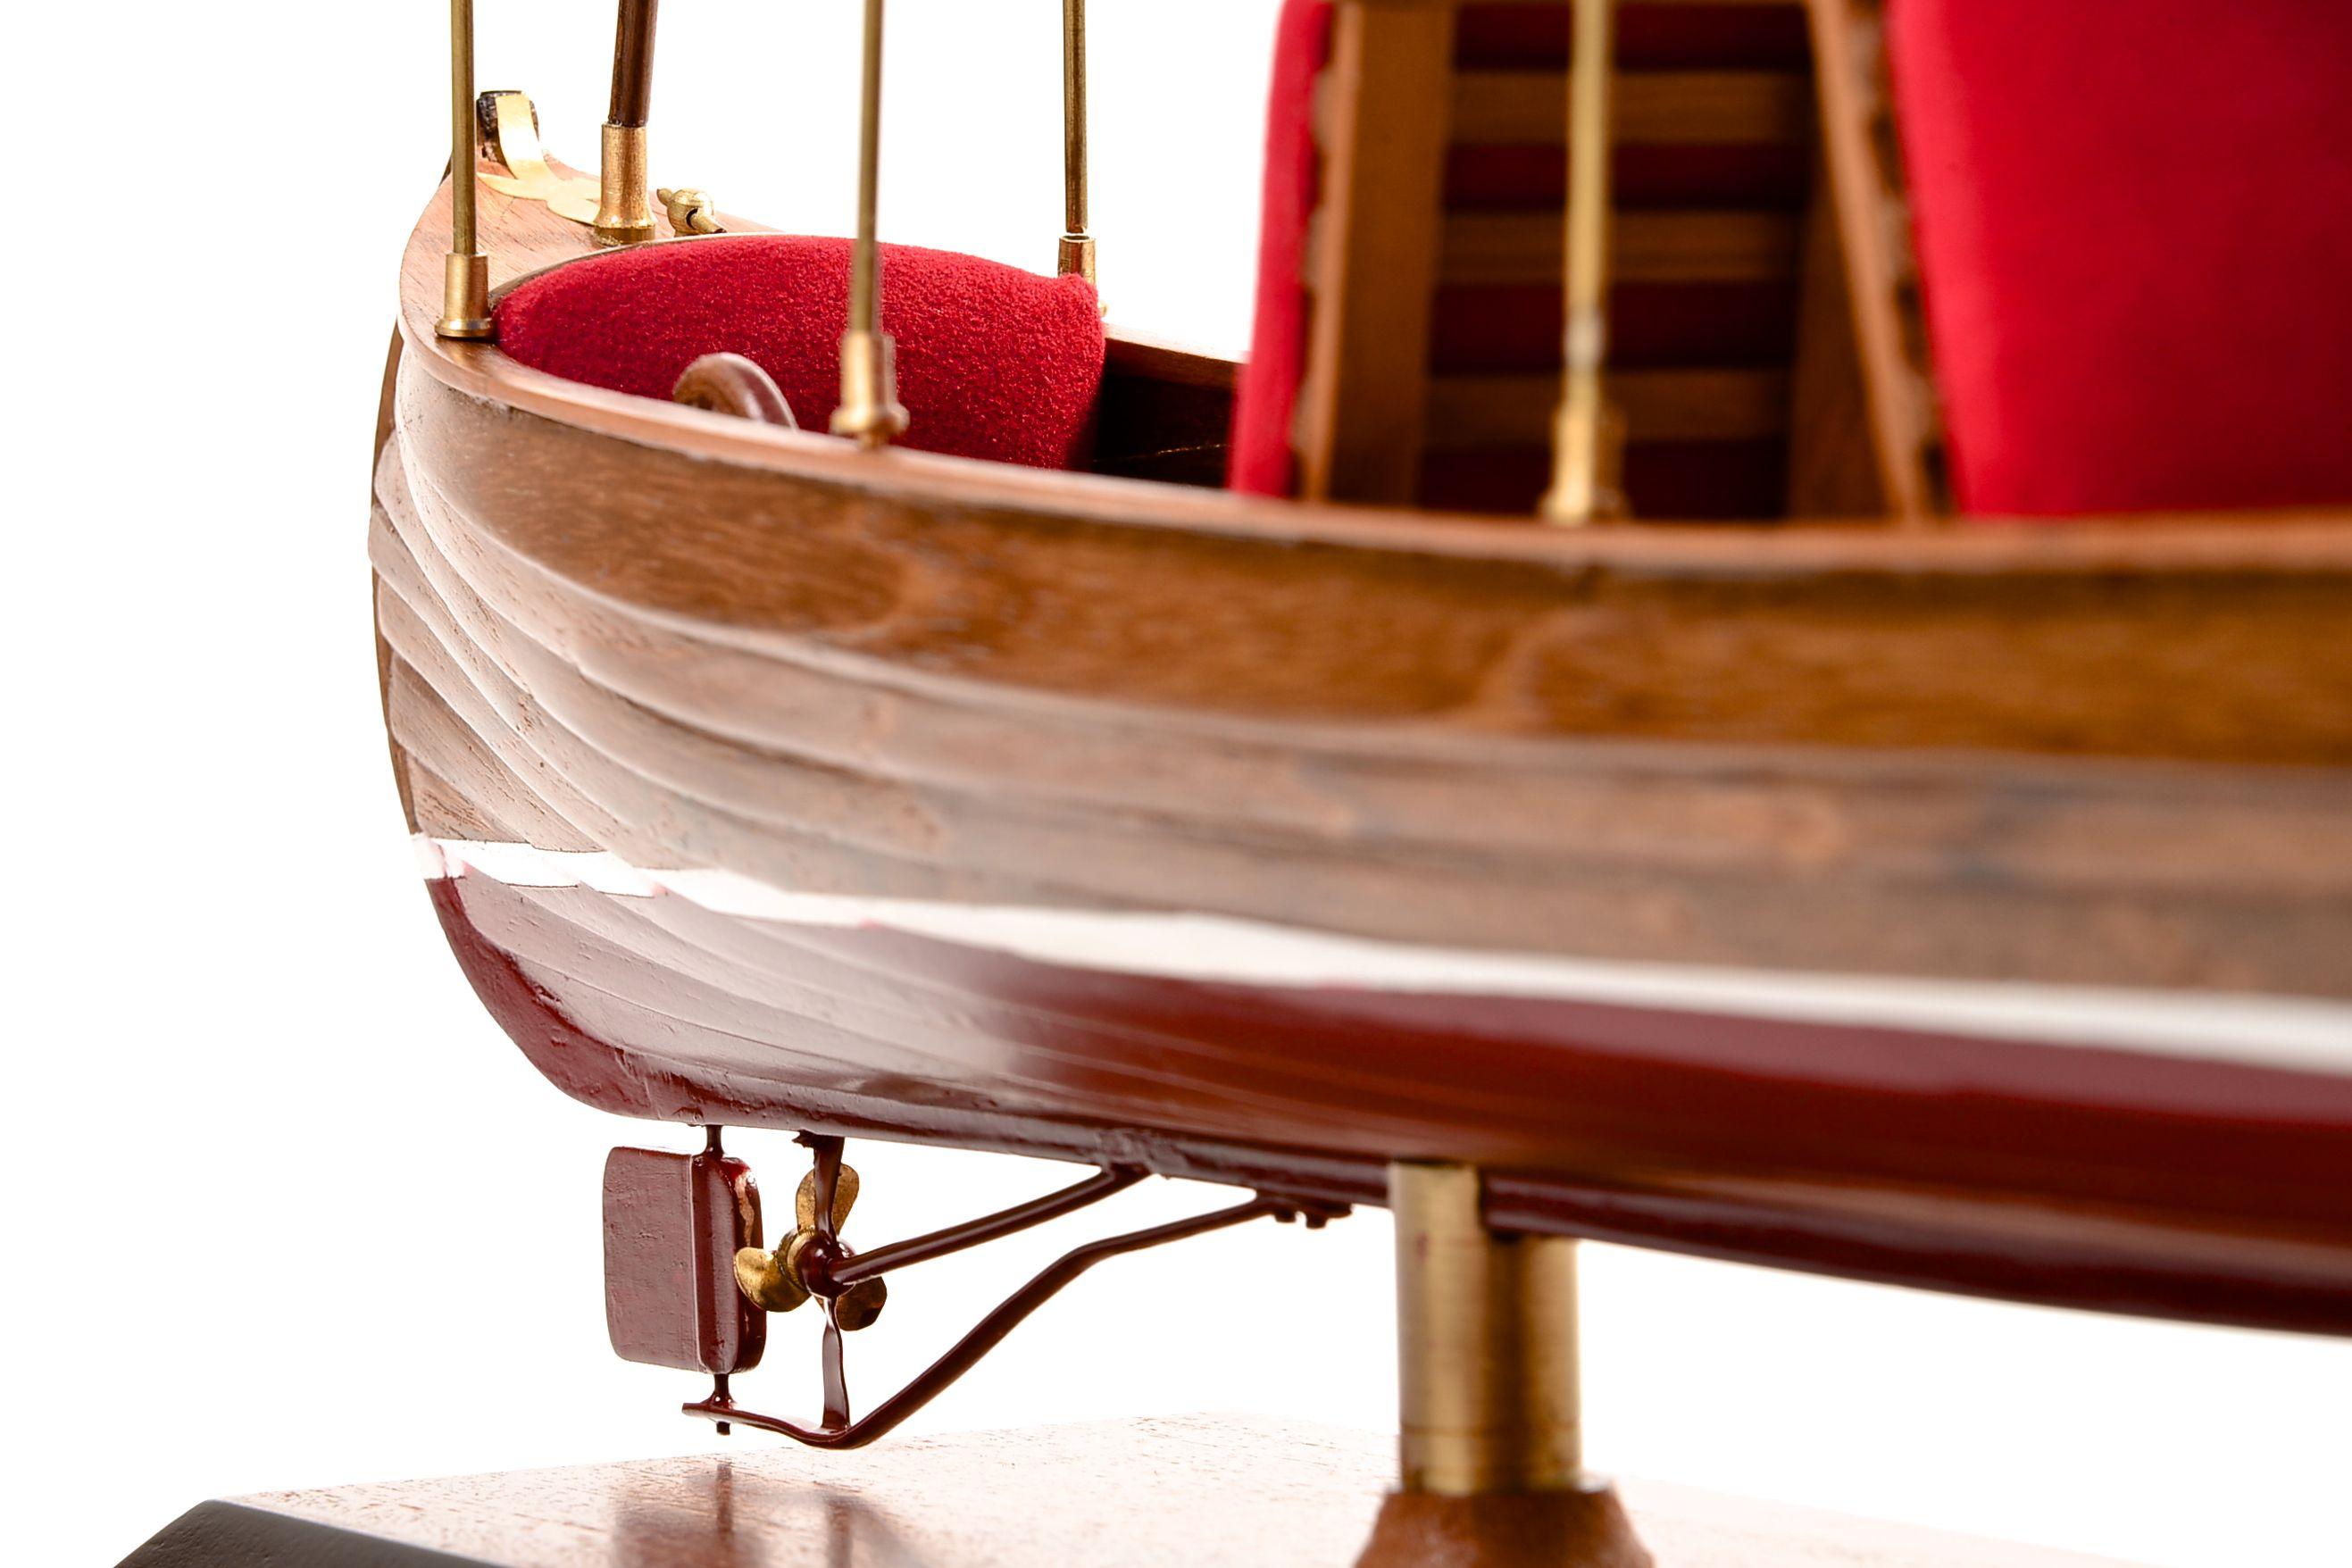 1865-11243-Liddesdale-Electric-Canoe-1920